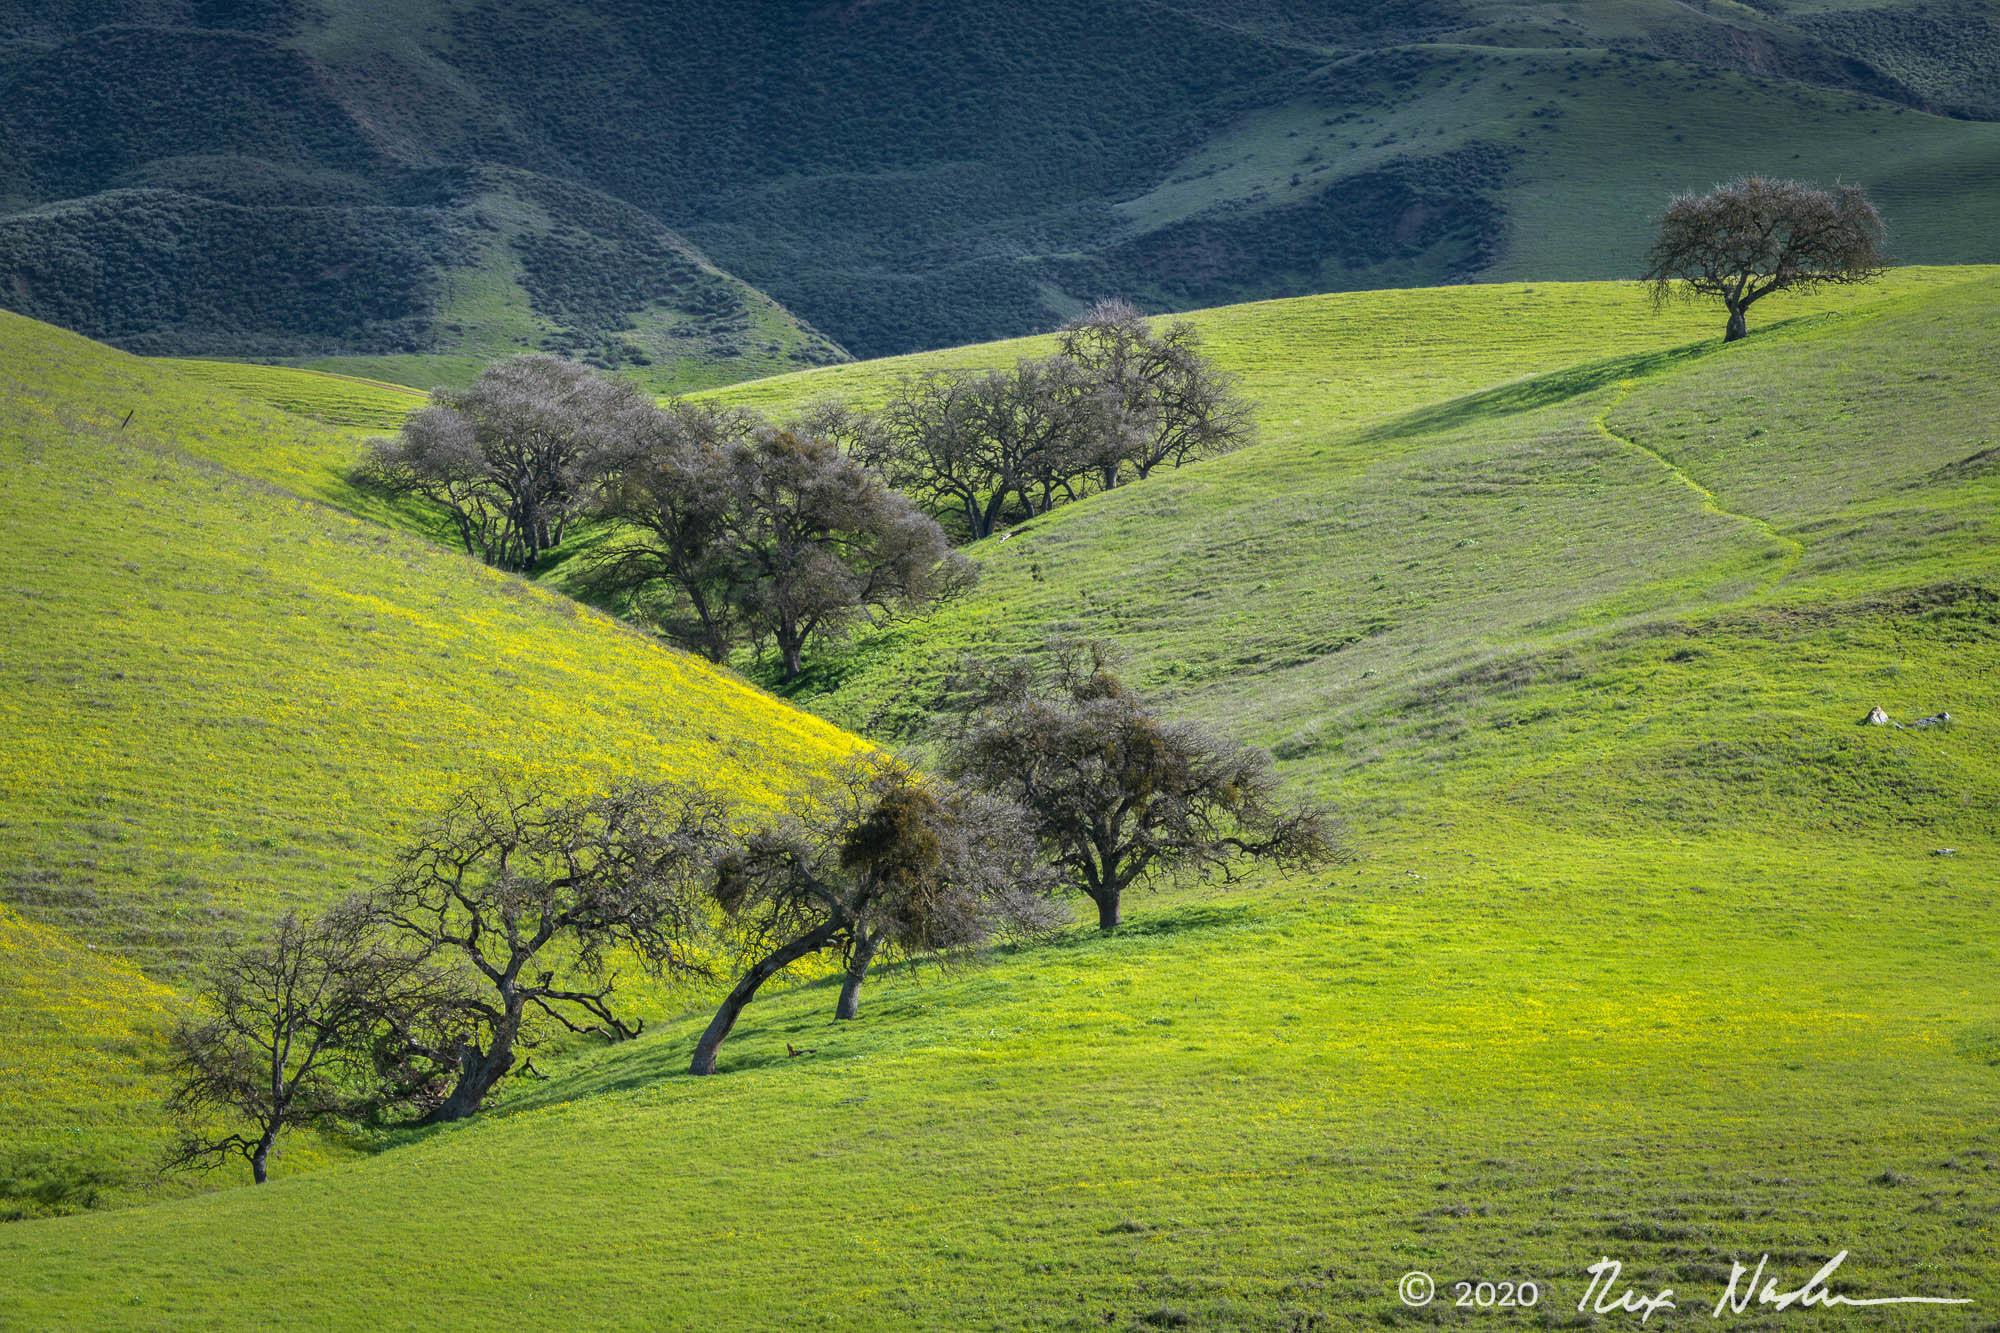 Pathway - San Benito County